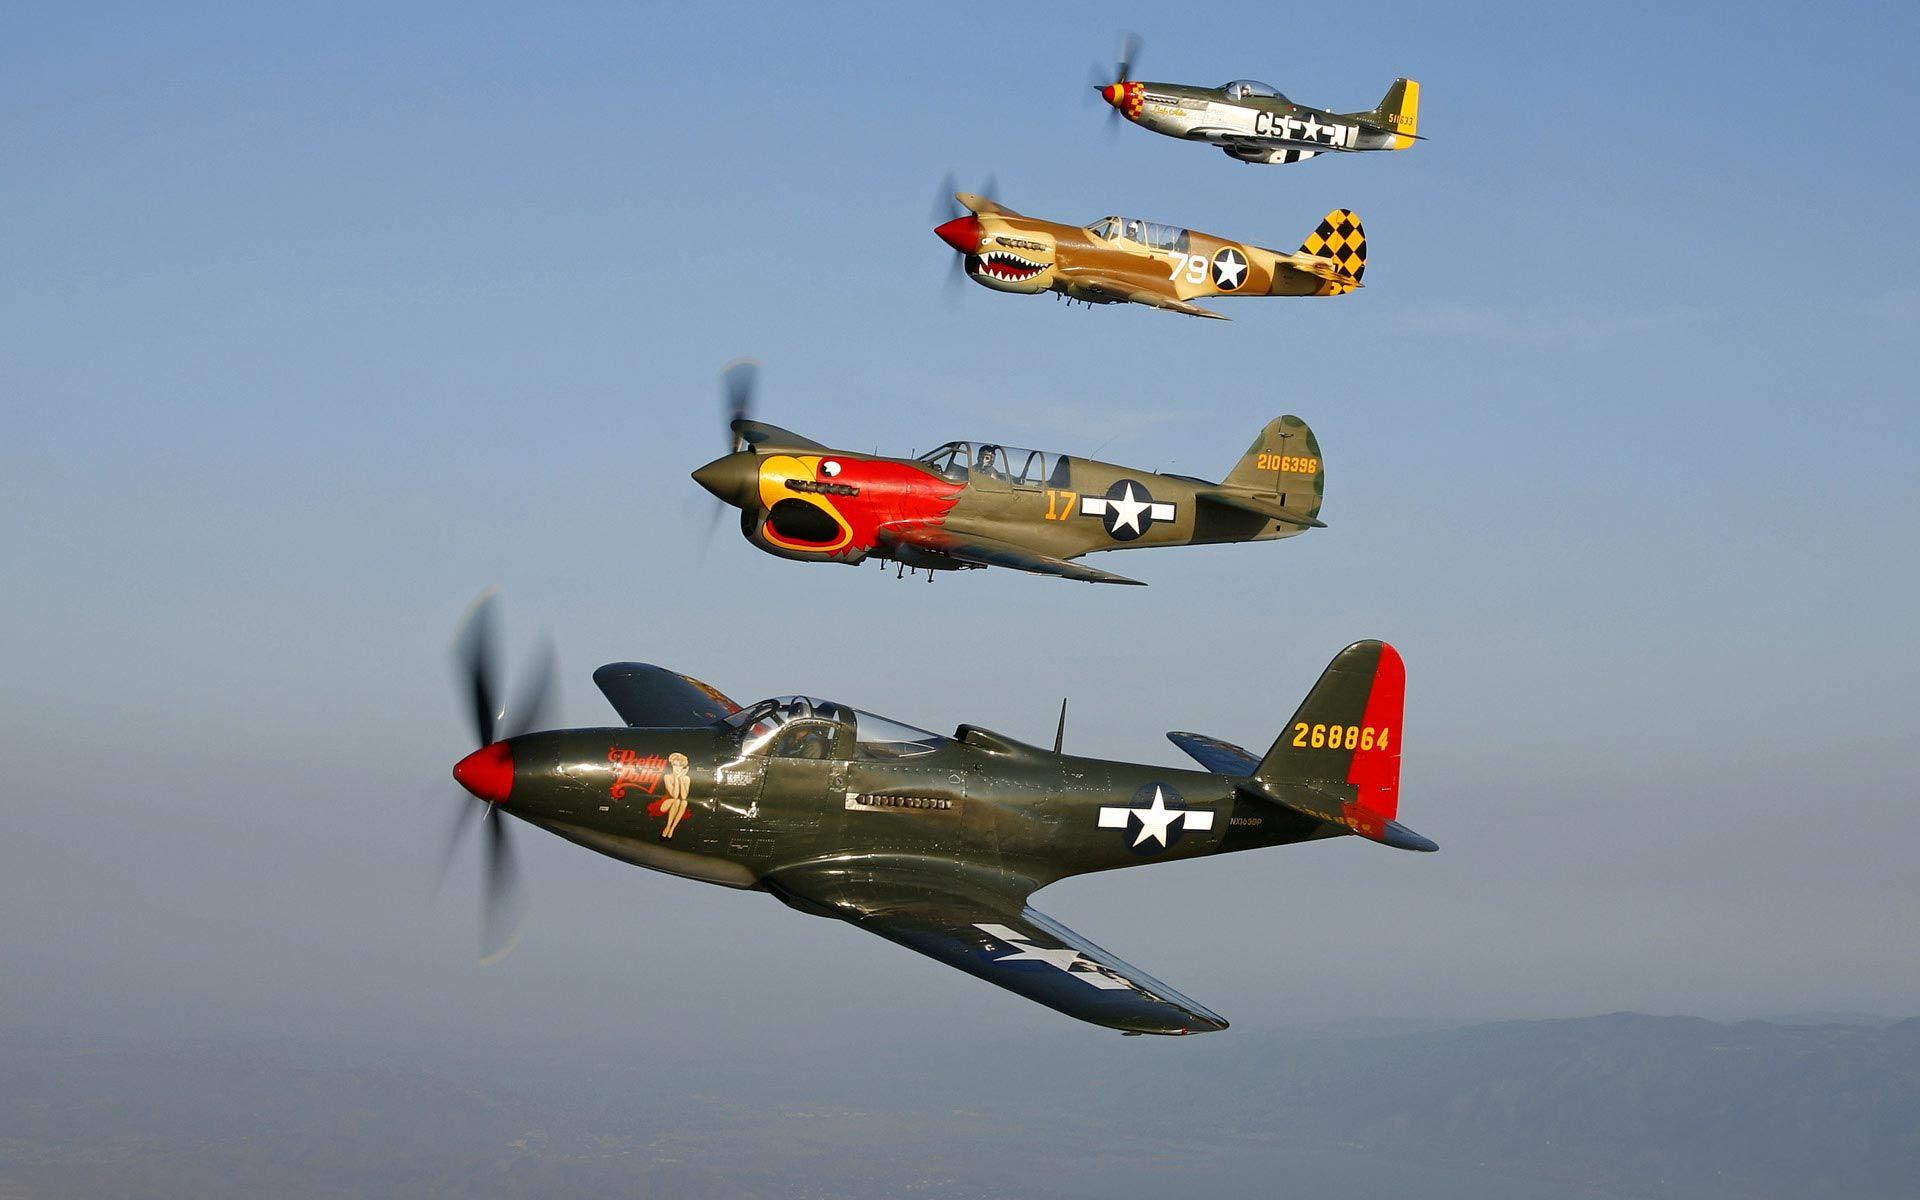 old airplanes hd wallpaper wallpaper place com Î Î Î Î space